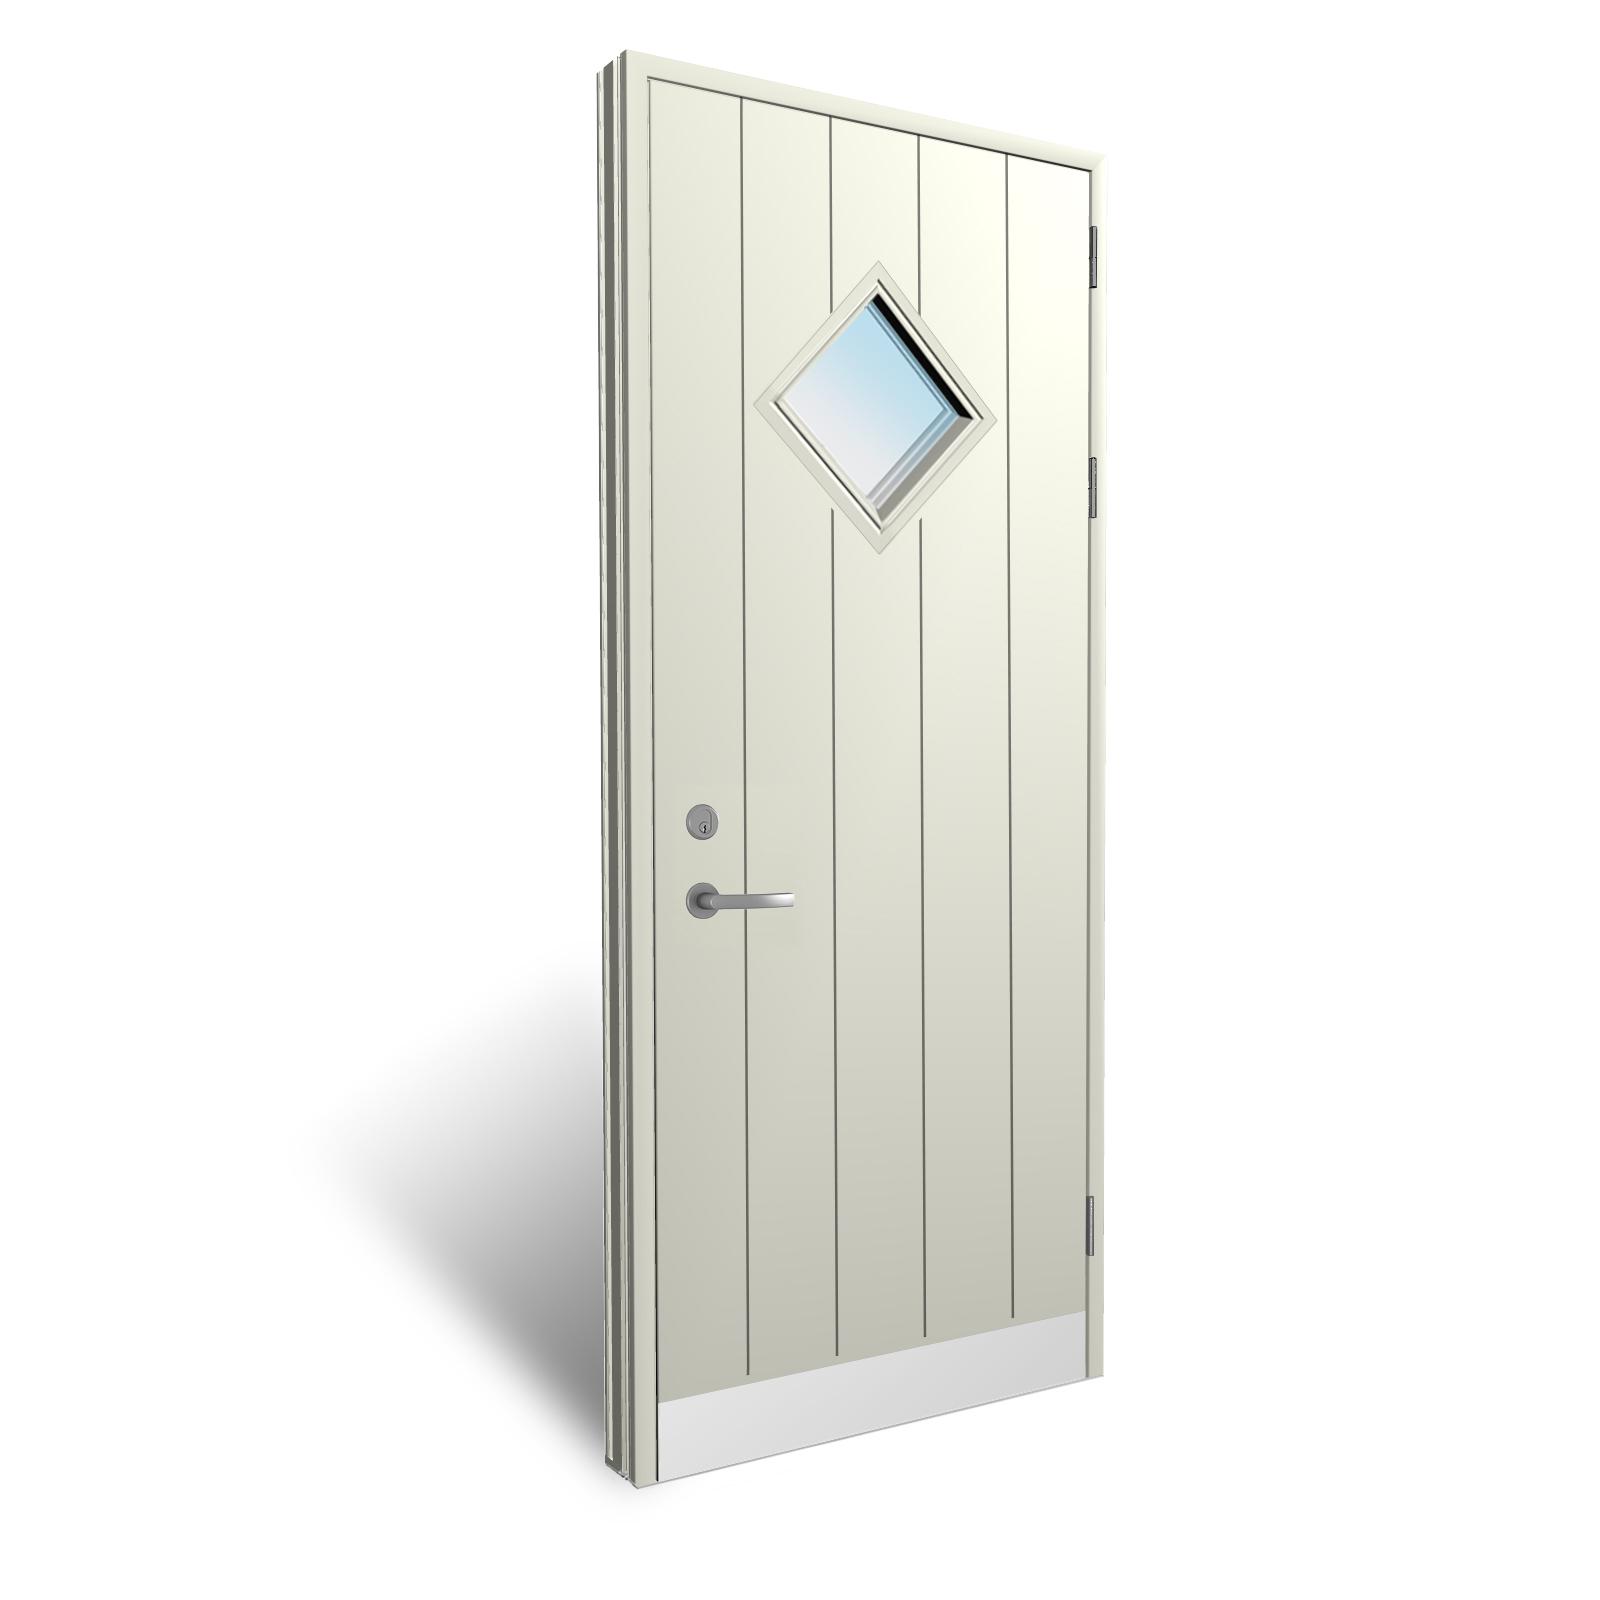 Hardwood Threshold For Inward Opening Front Doors